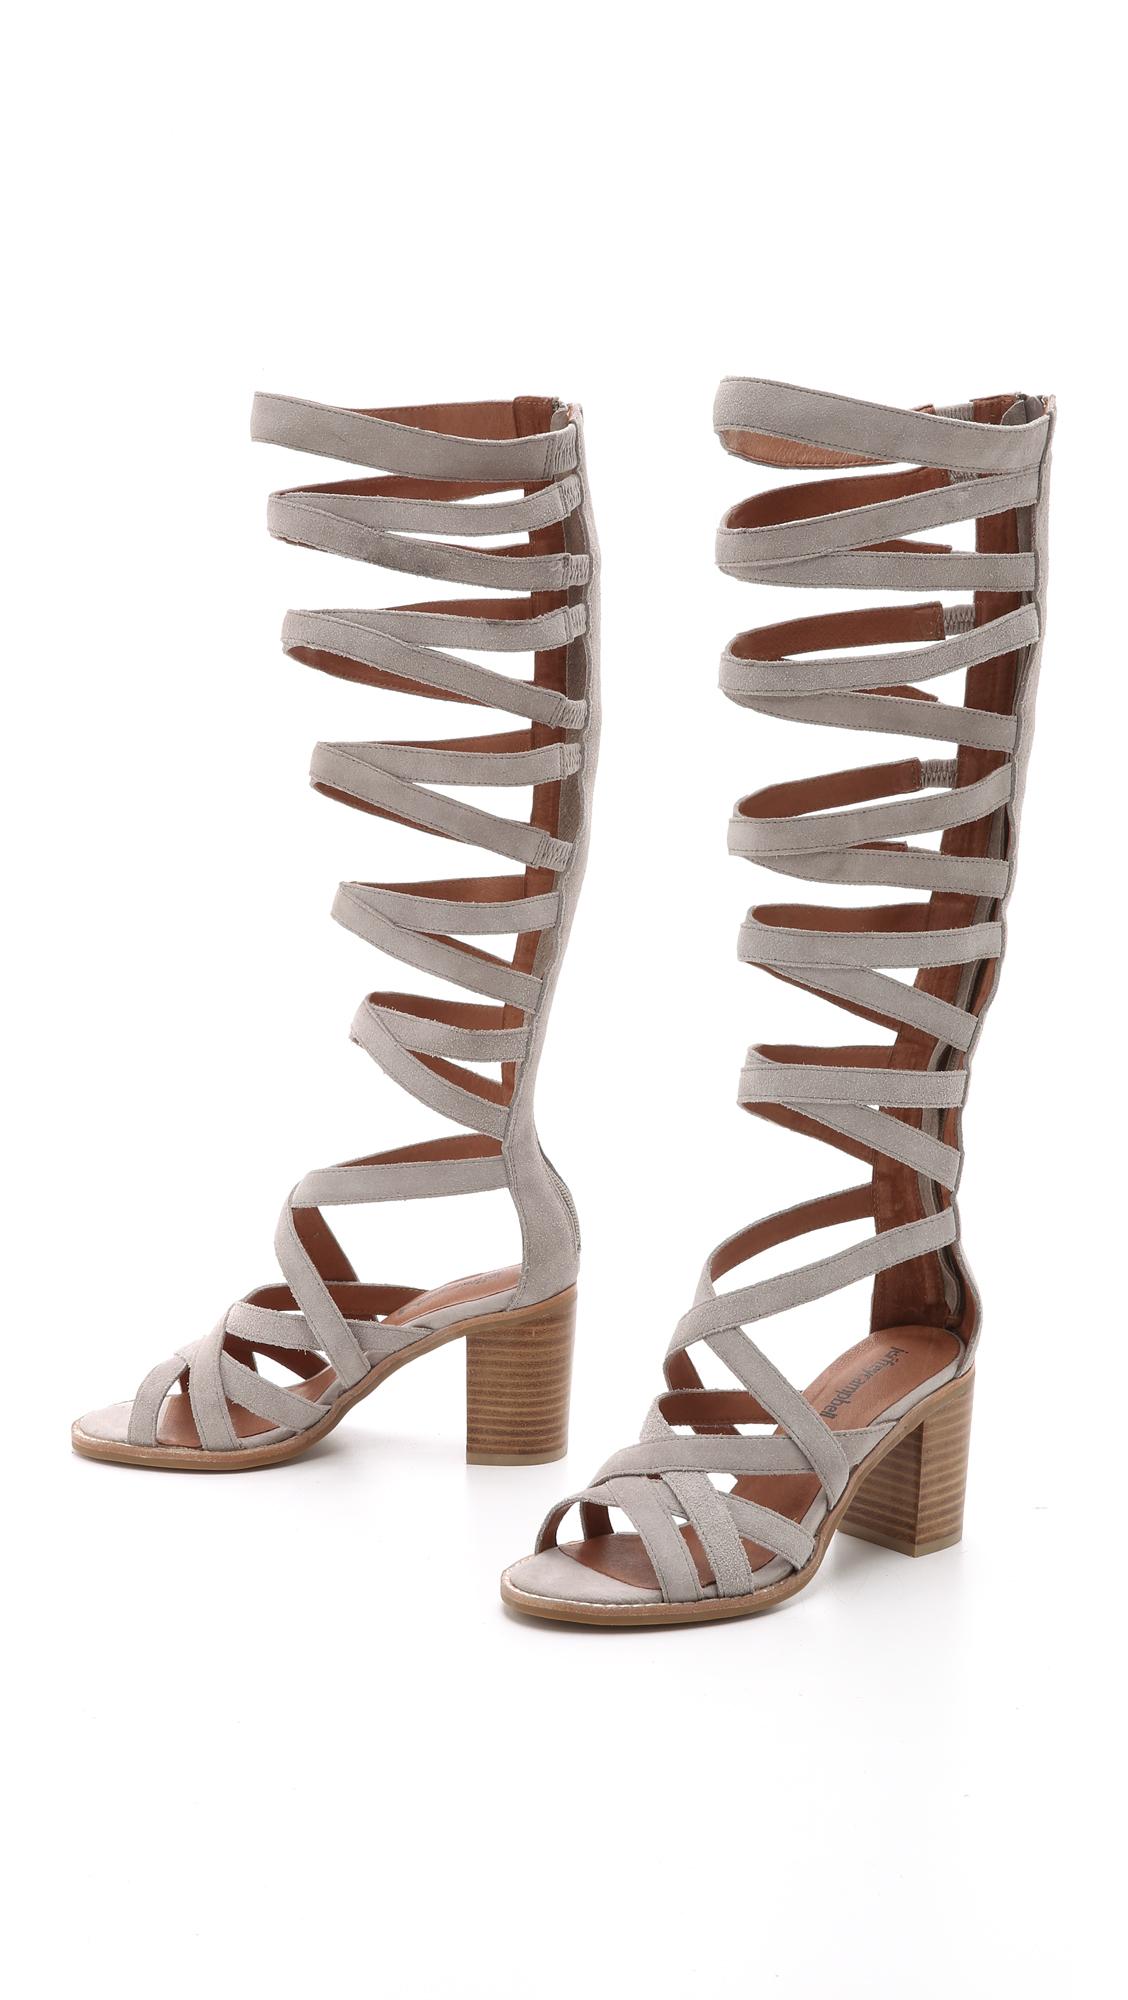 6b310b8ac8c1 Jeffrey Campbell Enyo Gladiator Sandals